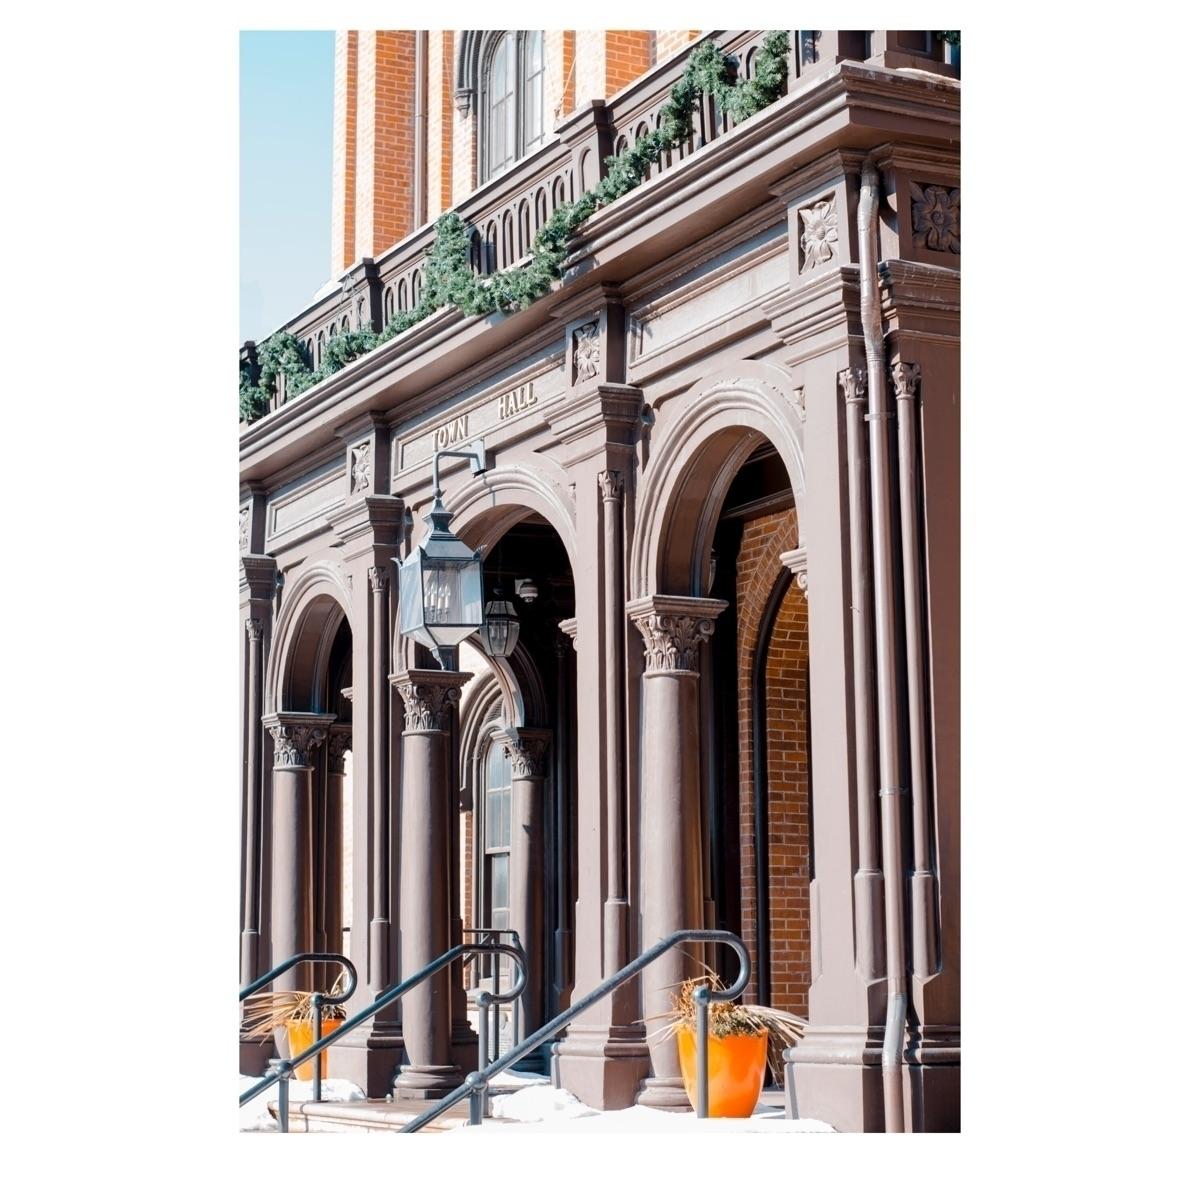 Editing town hall orange filter - _edwardwang | ello